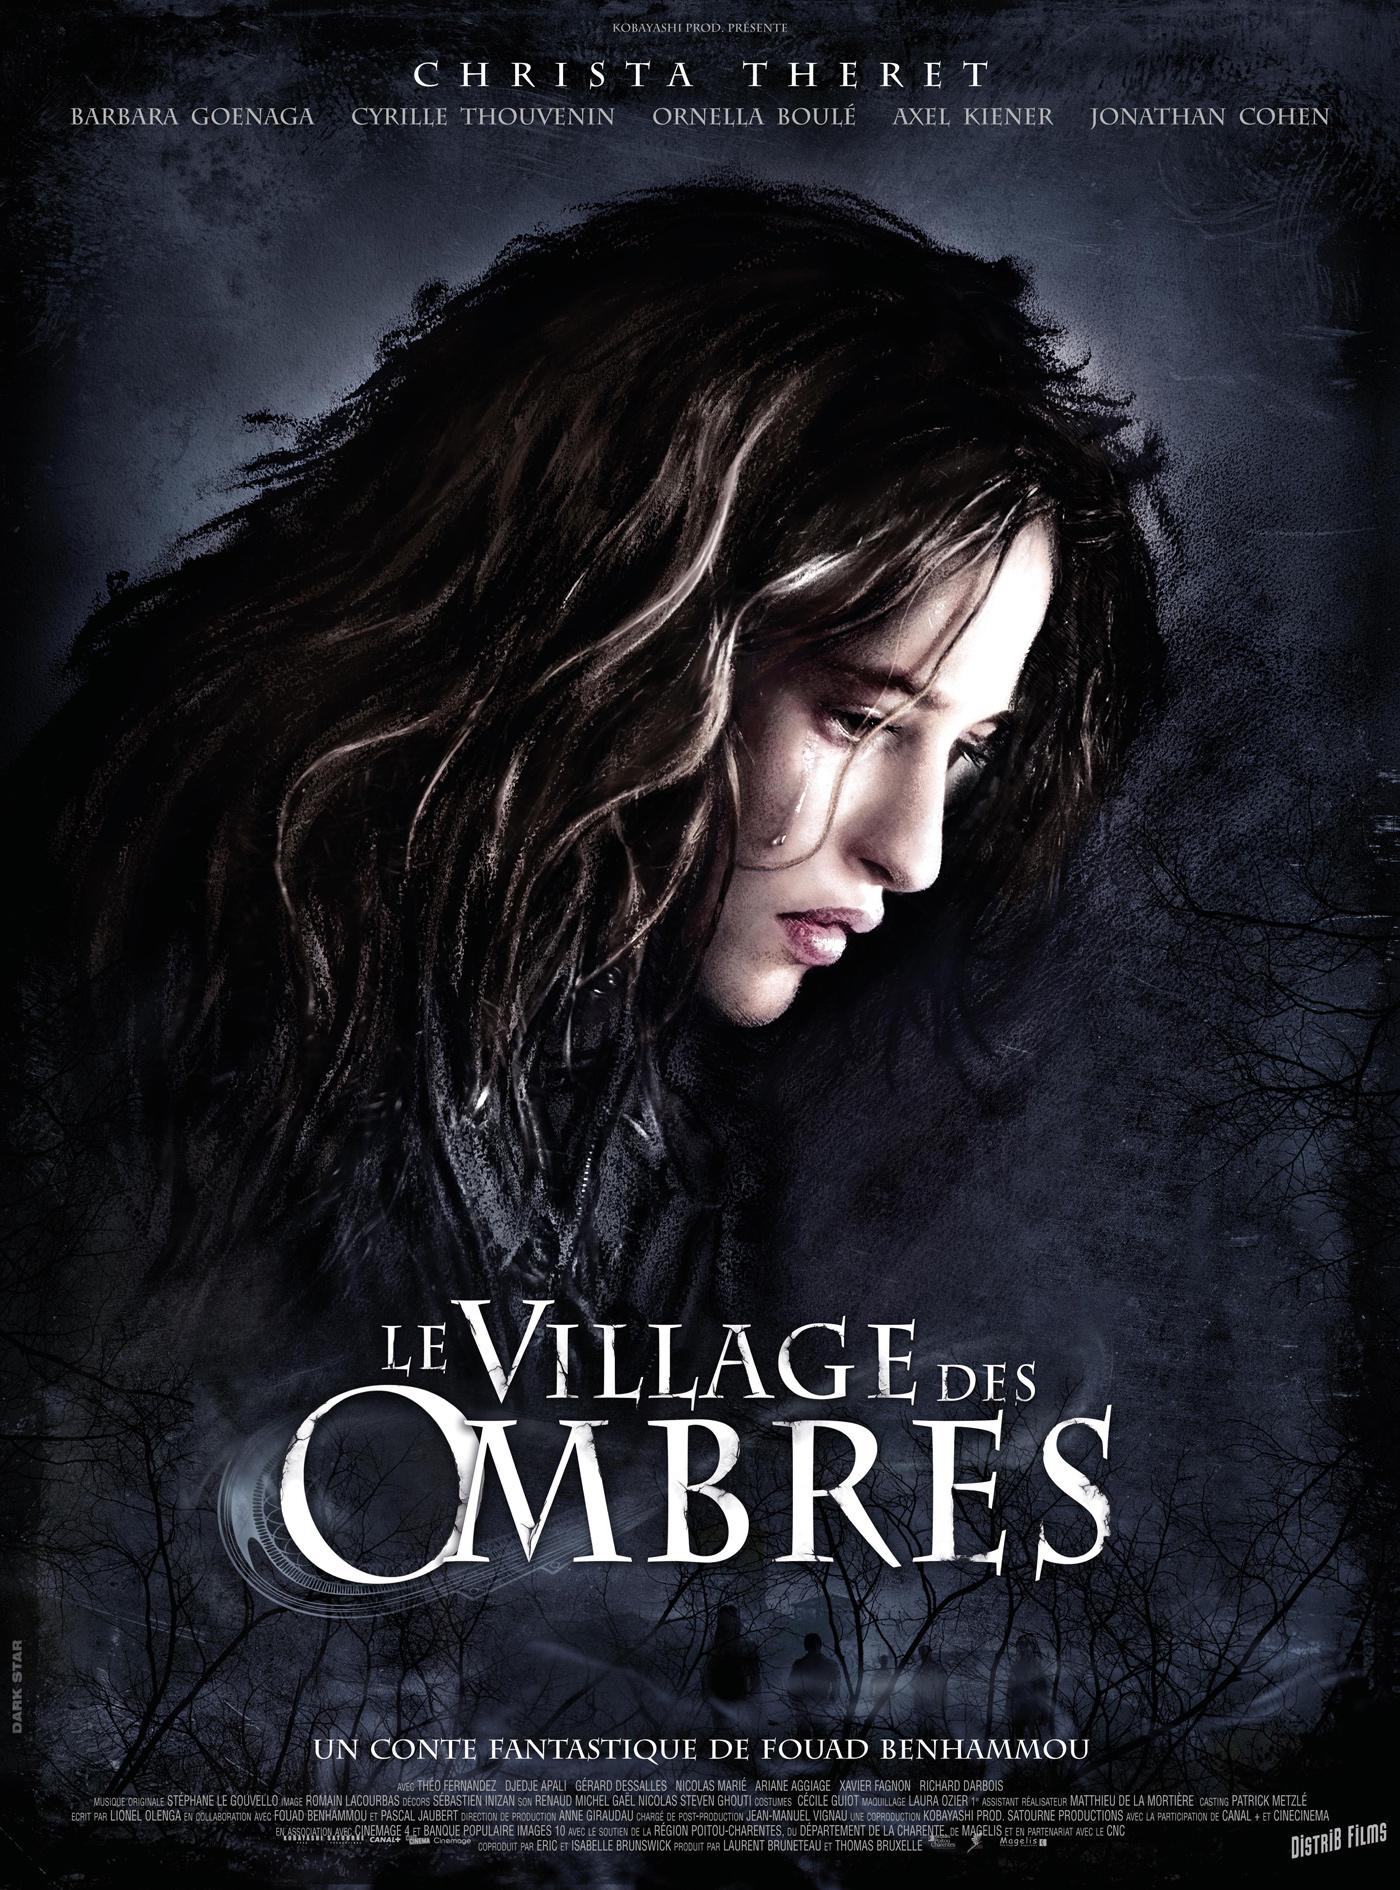 le_village_ds_ombres_post.jpg